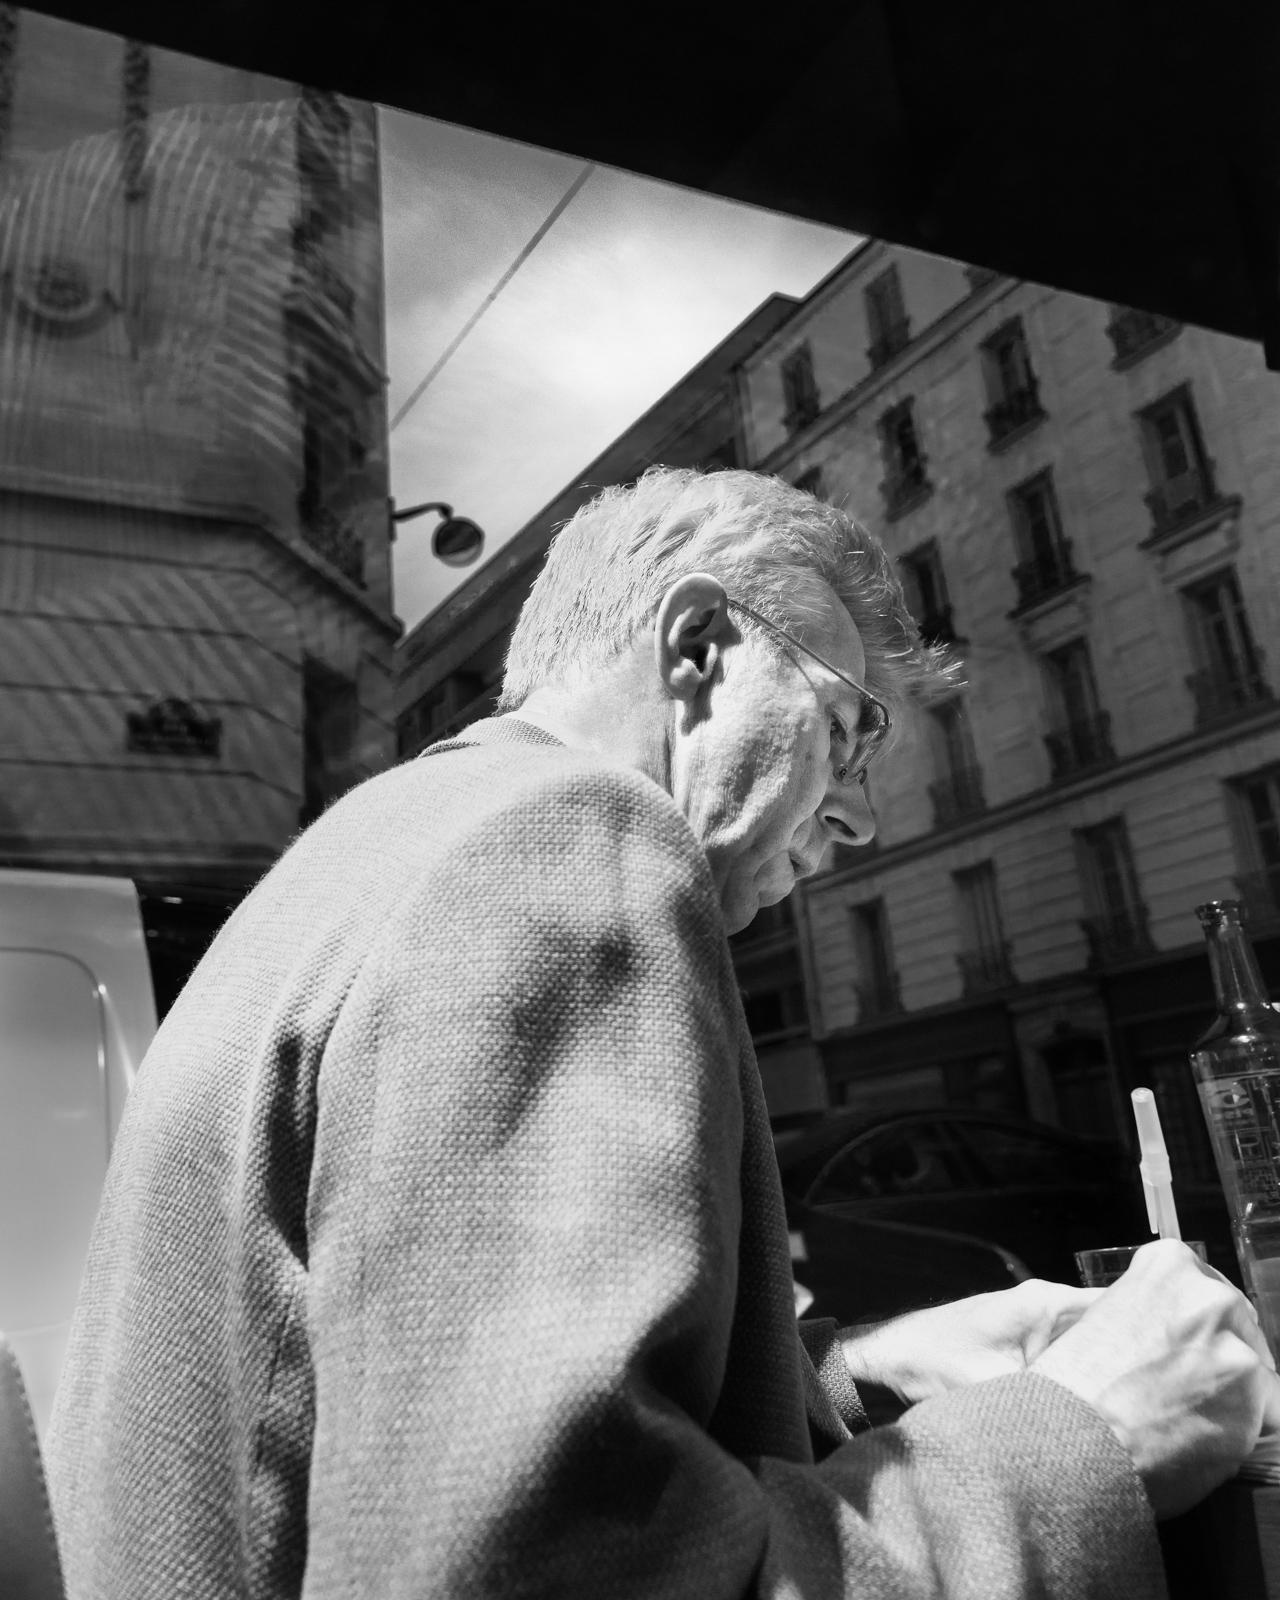 Working at a sidewalk cafe, Paris, 2013